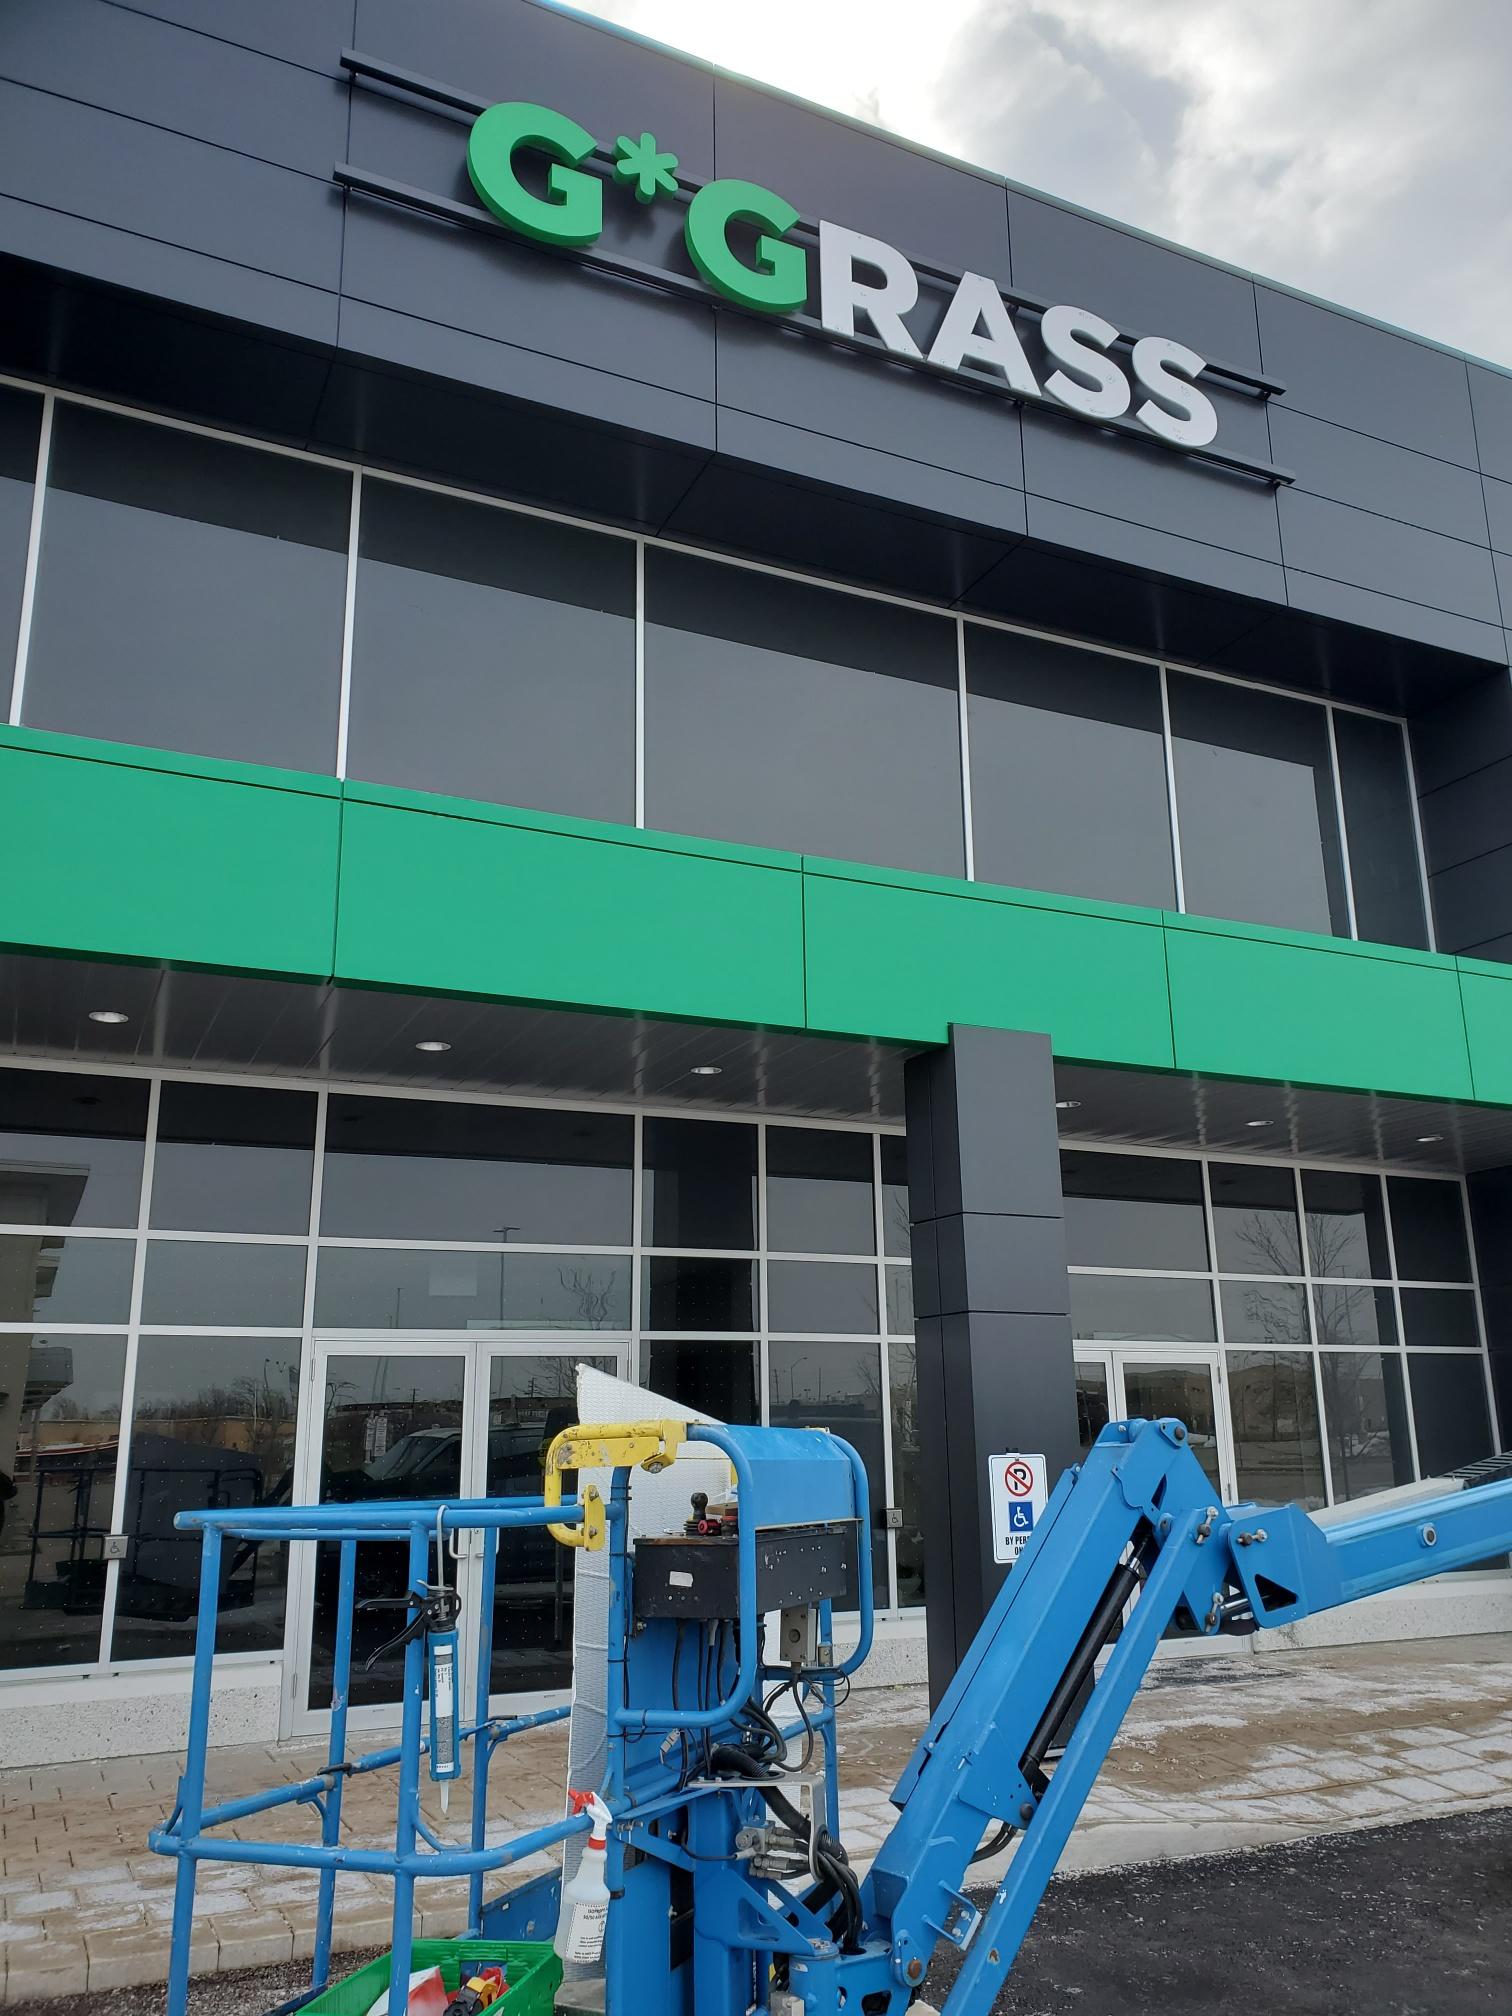 GRASS EXTERIOR STAINLESS (3)